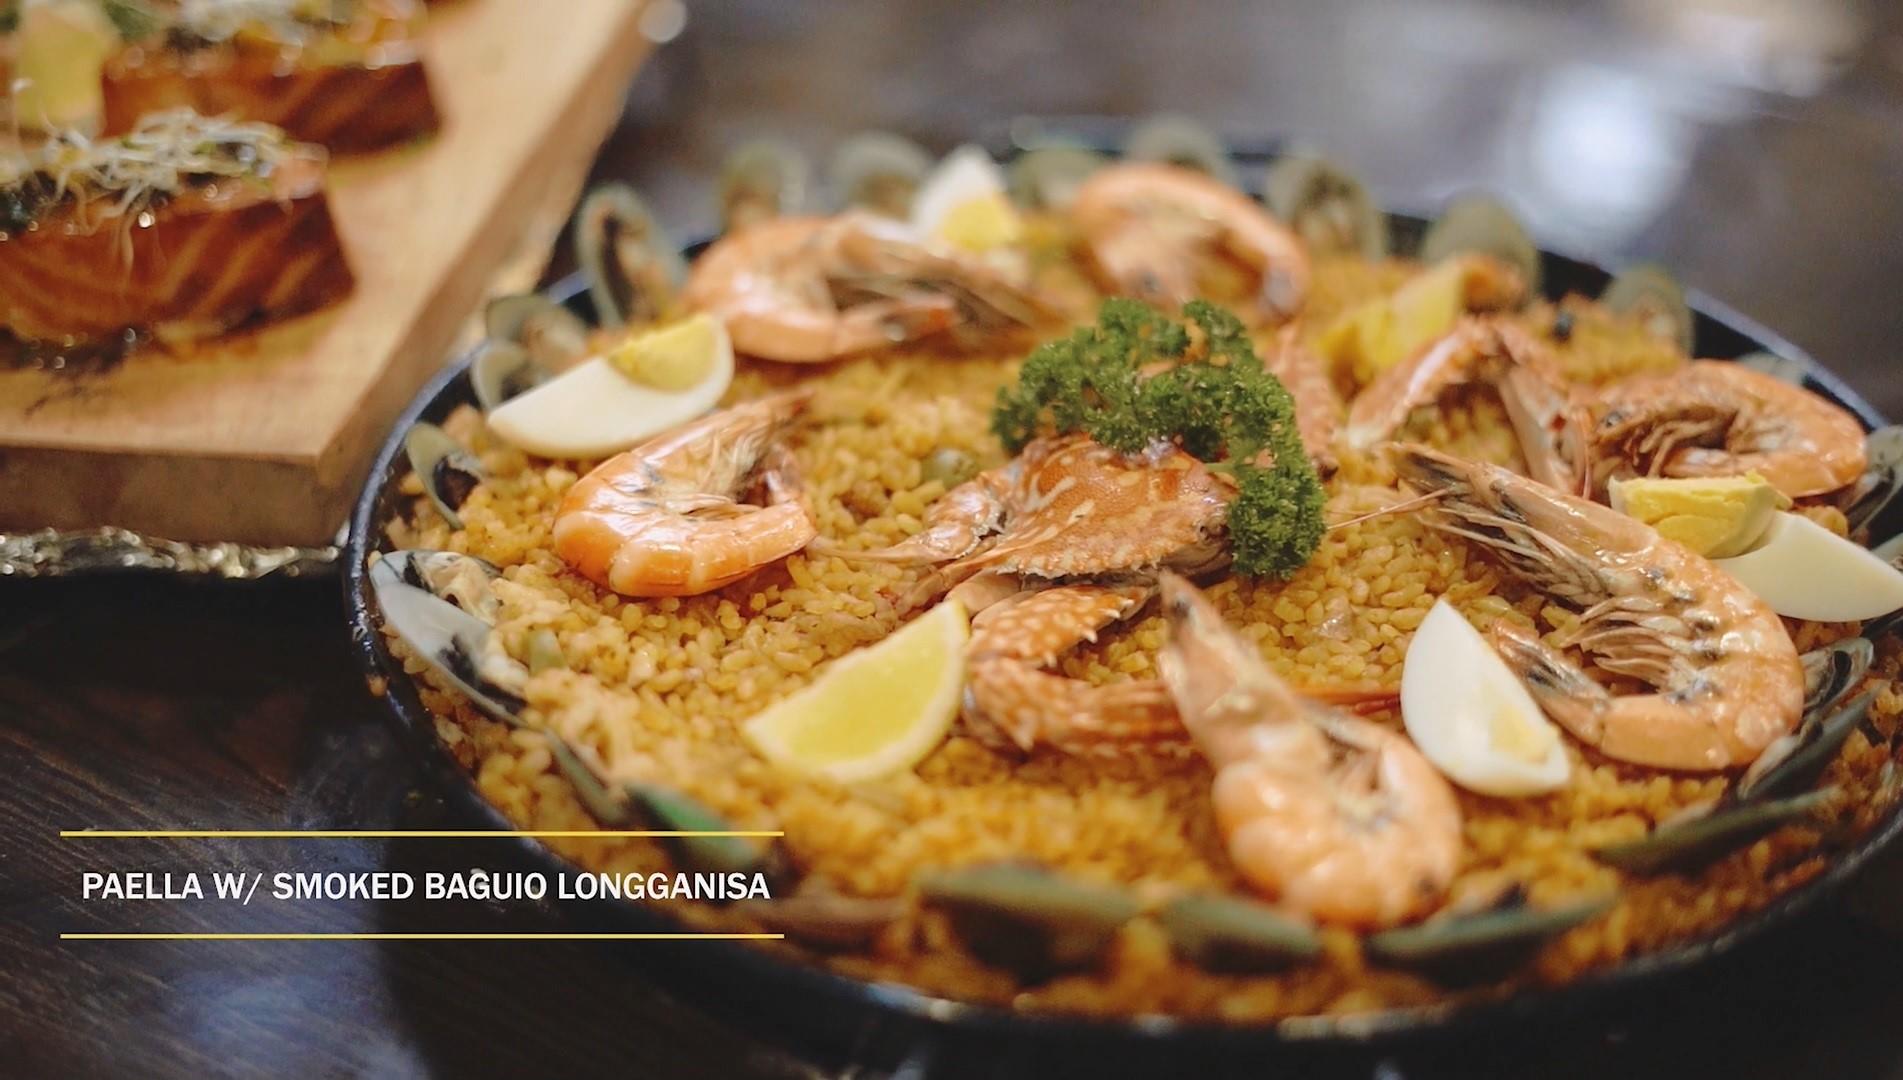 Paella with Baguio longganisa served at Cocina del Sol